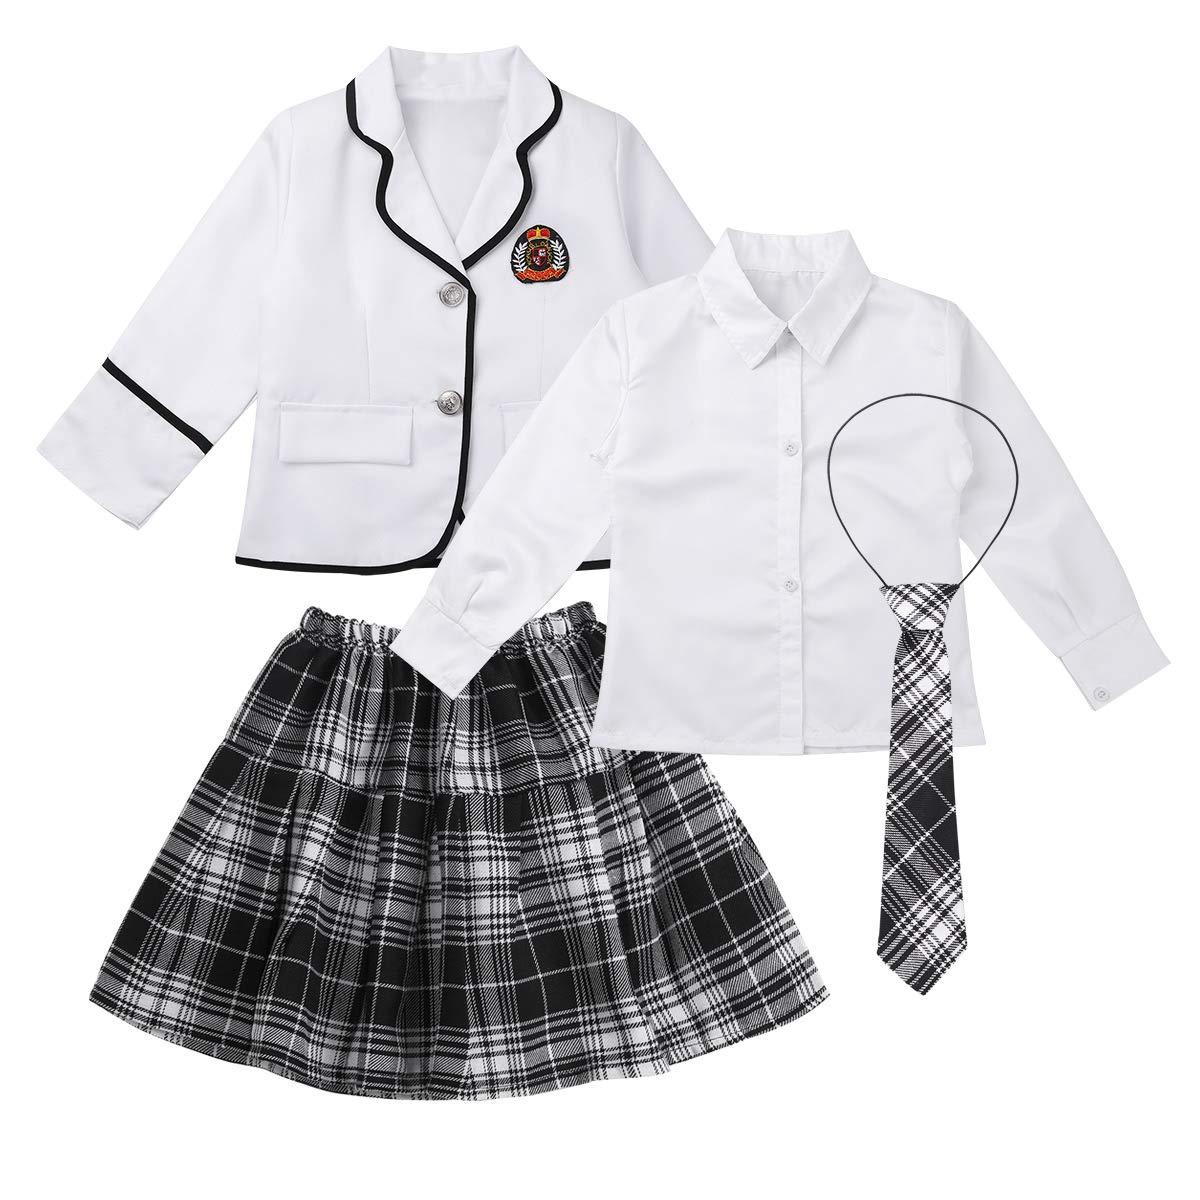 TiaoBug 4Pcs Uniforme Escolar Japon/és Coreano Brit/ánico Ni/ñas Muchachas Traje Conjunto Manga Larga Algod/ón Invierno Disfraz de Marinera Ni/ñas